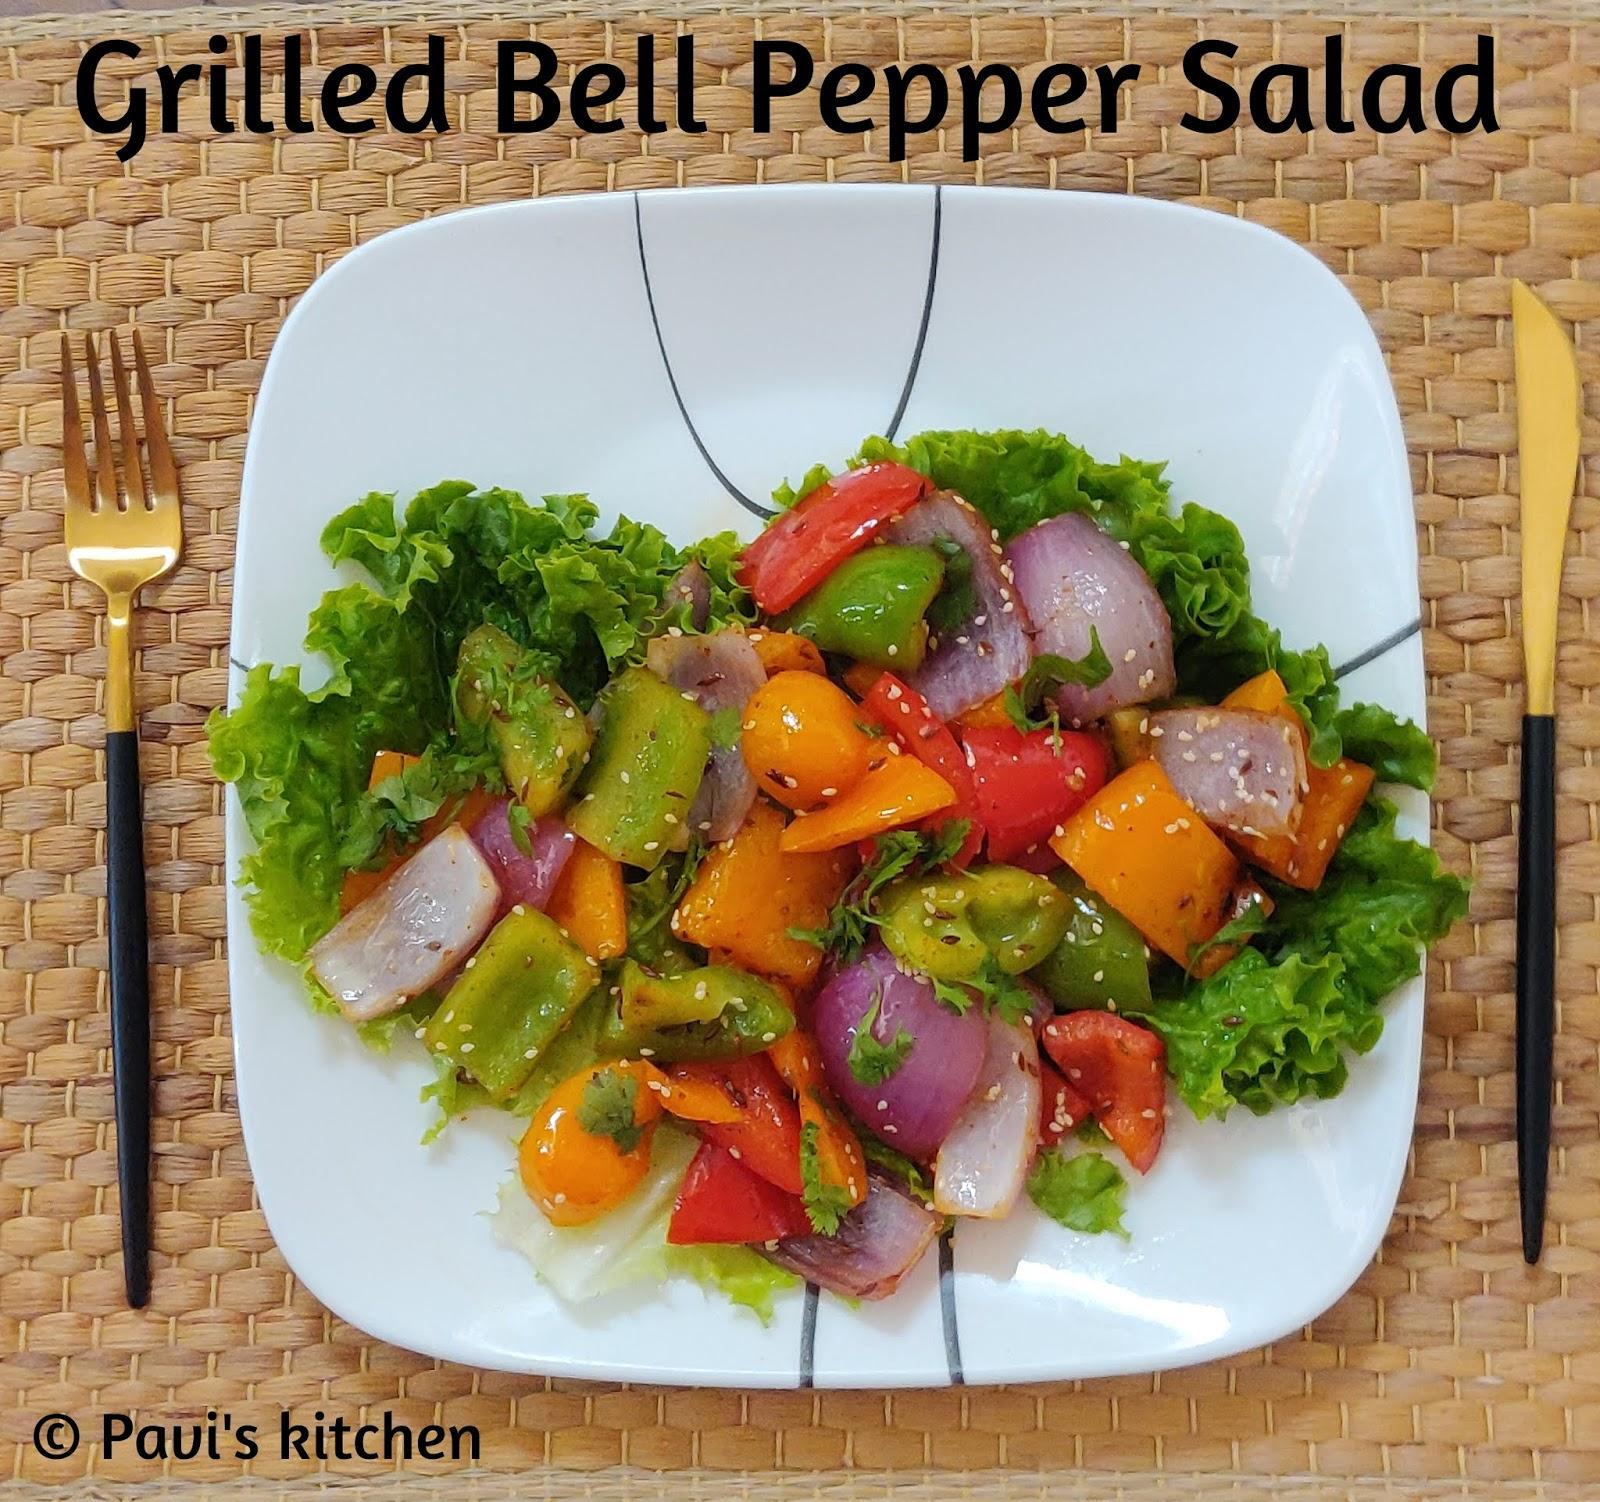 Grilled Bell Pepper Salad Recipe / Grilled Capsicum Salad Recipe